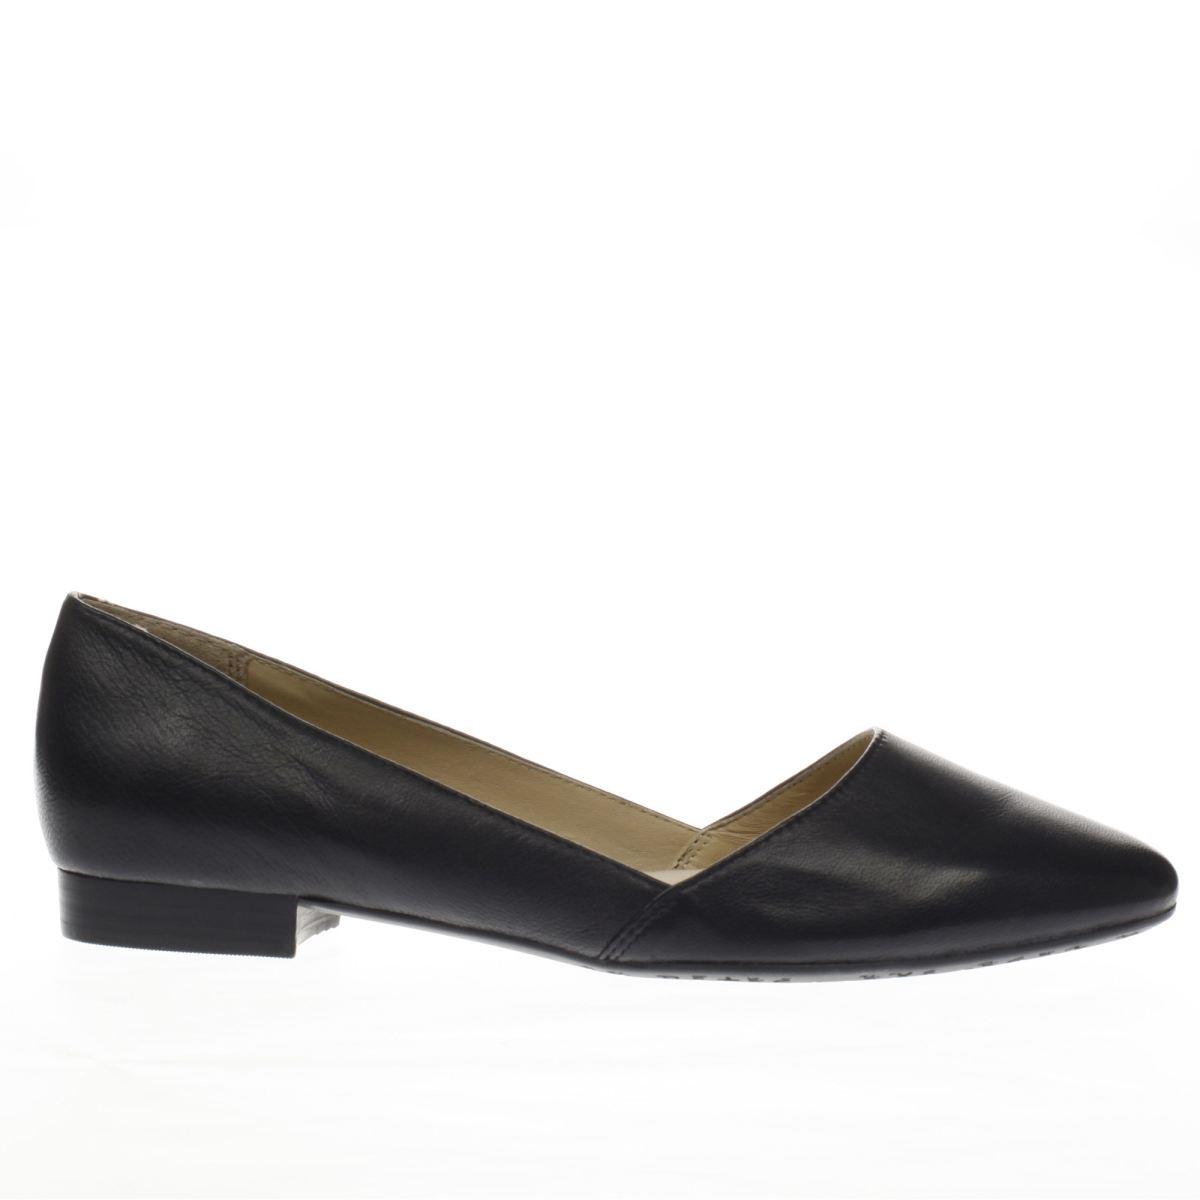 hush puppies black jovanna phoebe flat shoes